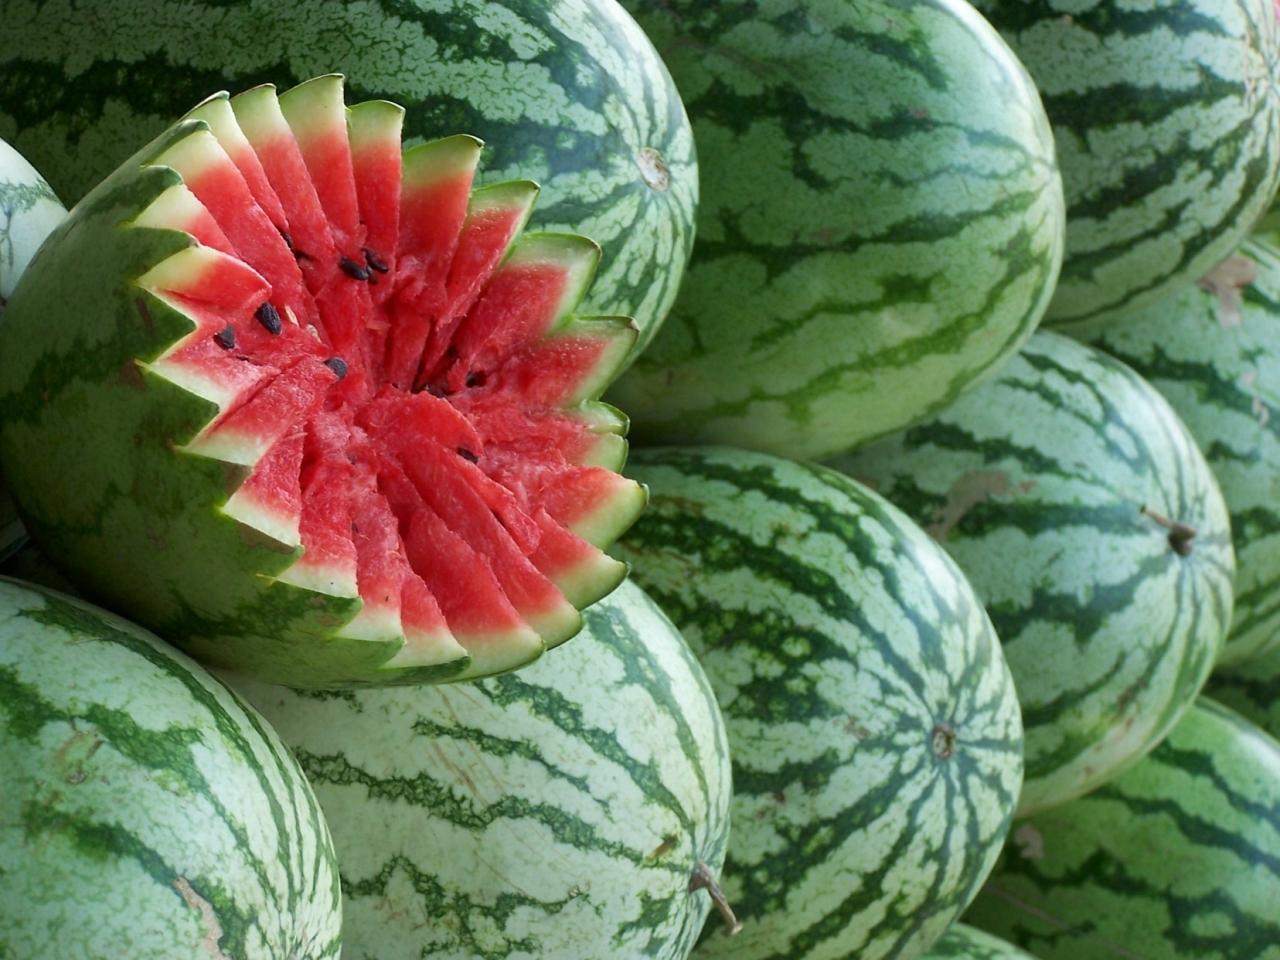 image from simplyorganic.com